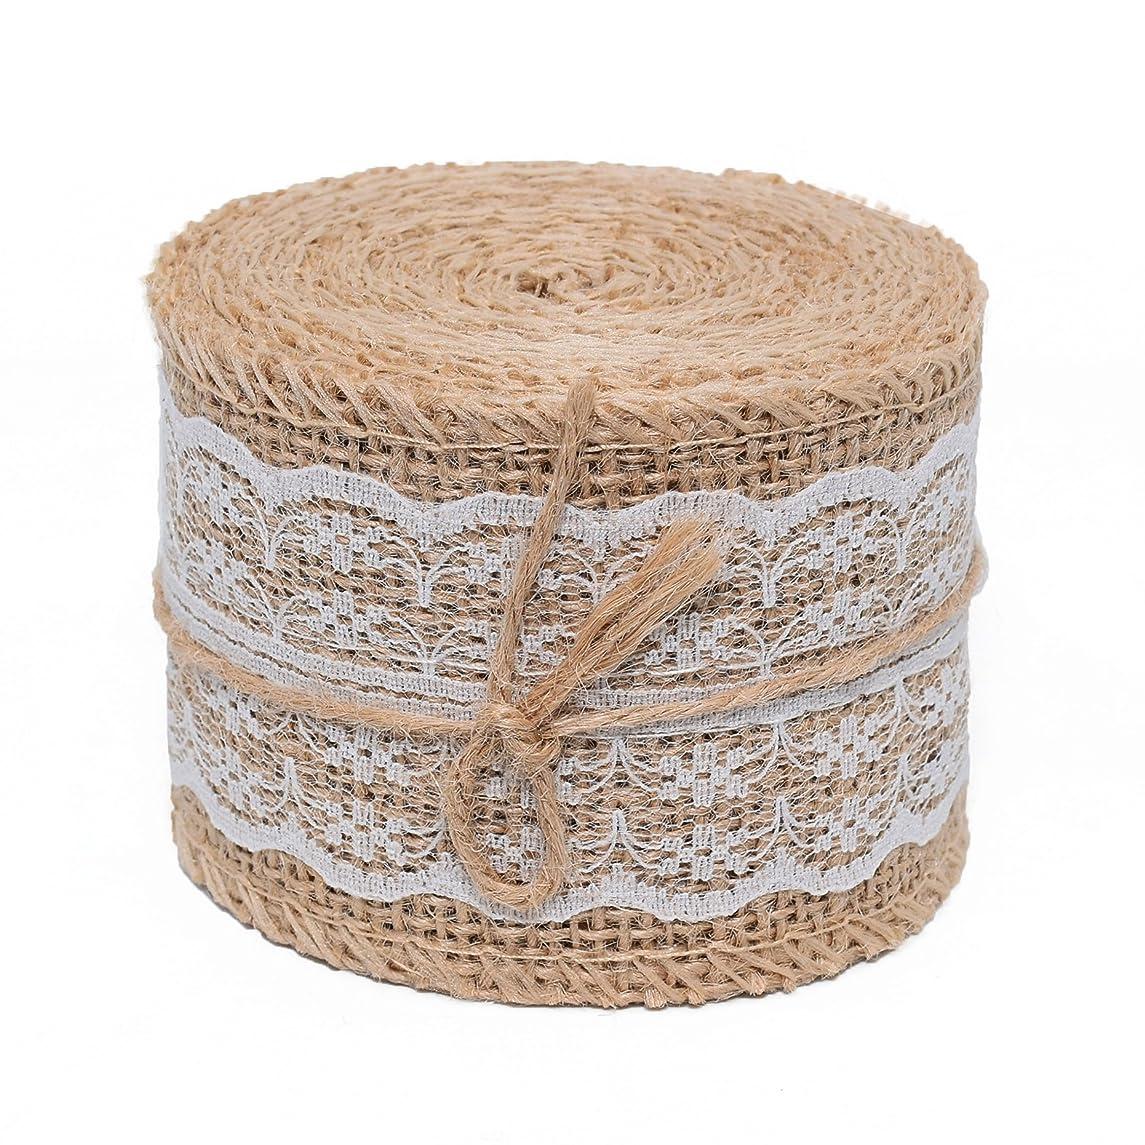 Burlap Ribbon Roll White Lace Trims Tape Natural Jute-2.34WIDTH156LONG INCH dojrwngbfn2